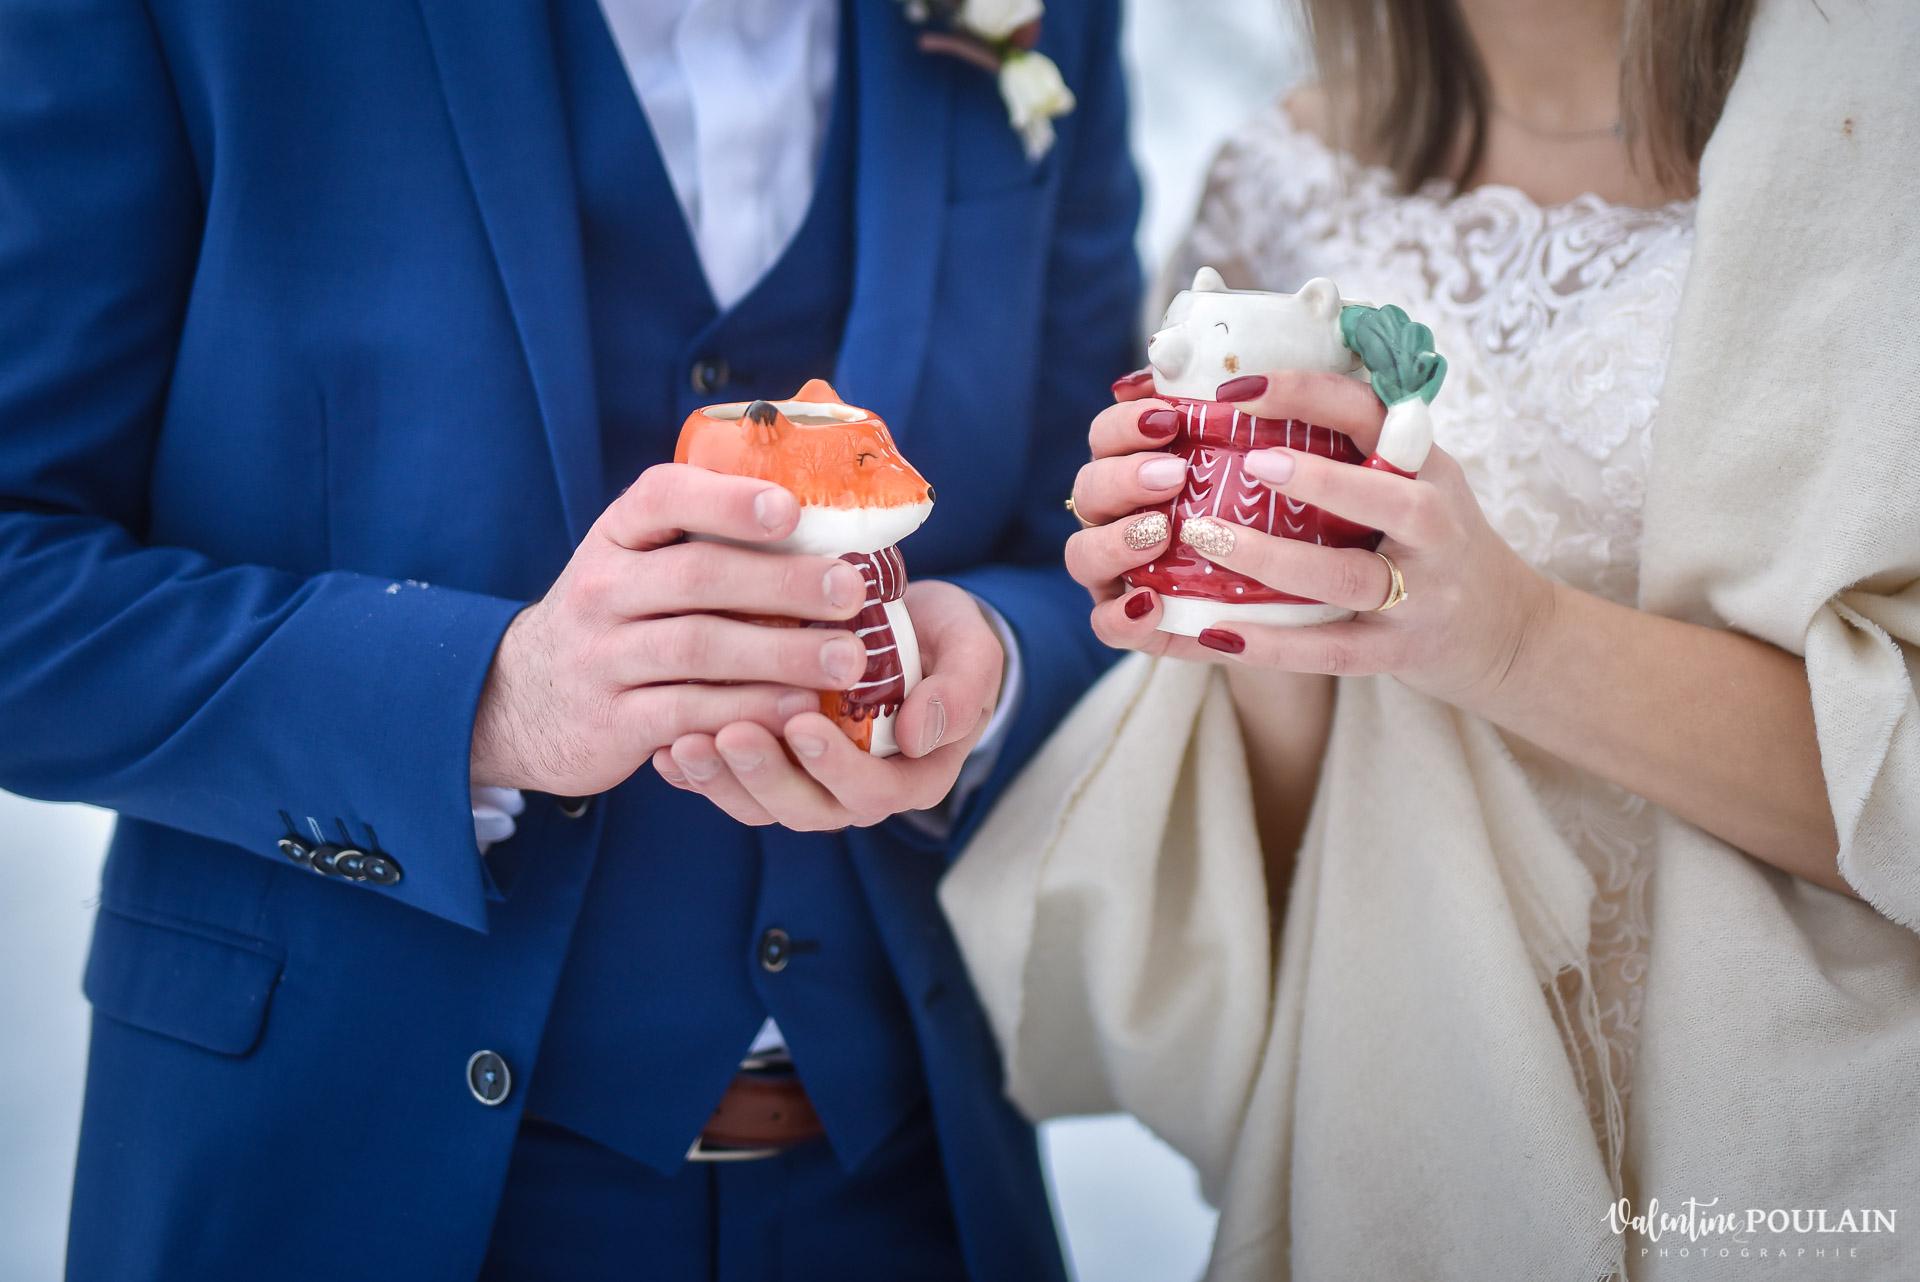 Photo mariage neige hiver - Valentine Poulain chocolat chaud